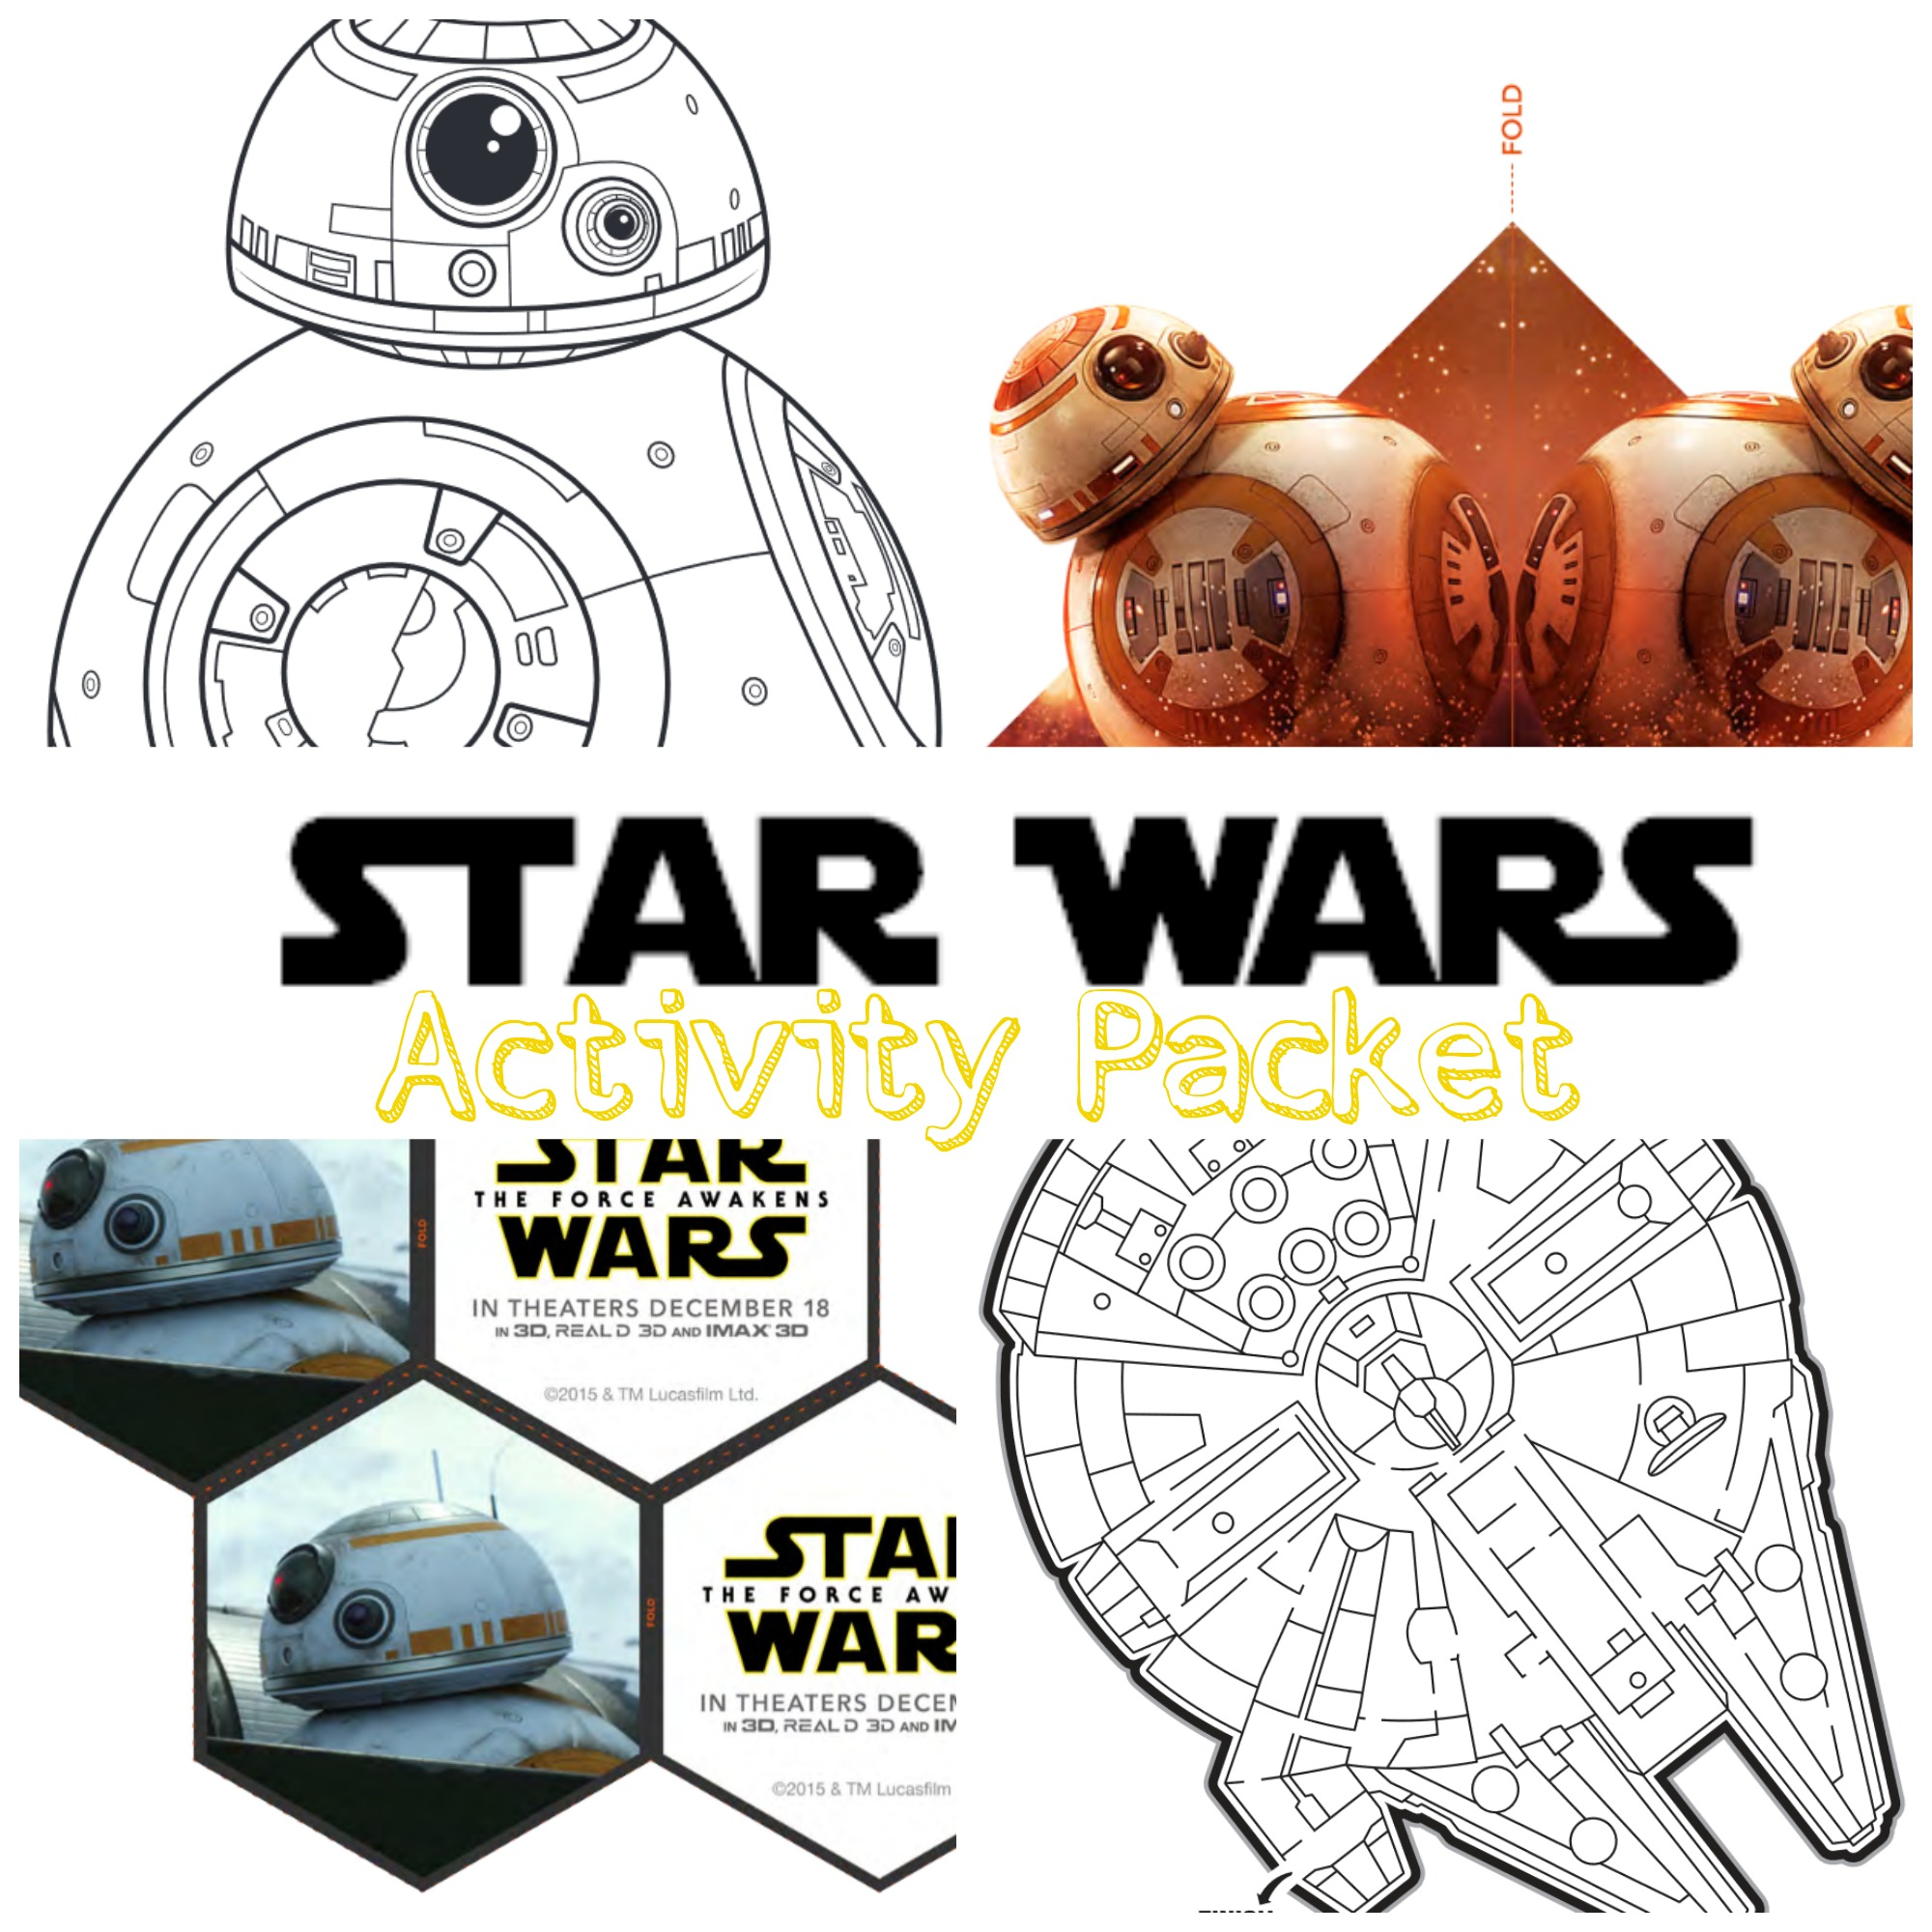 star wars activity packet